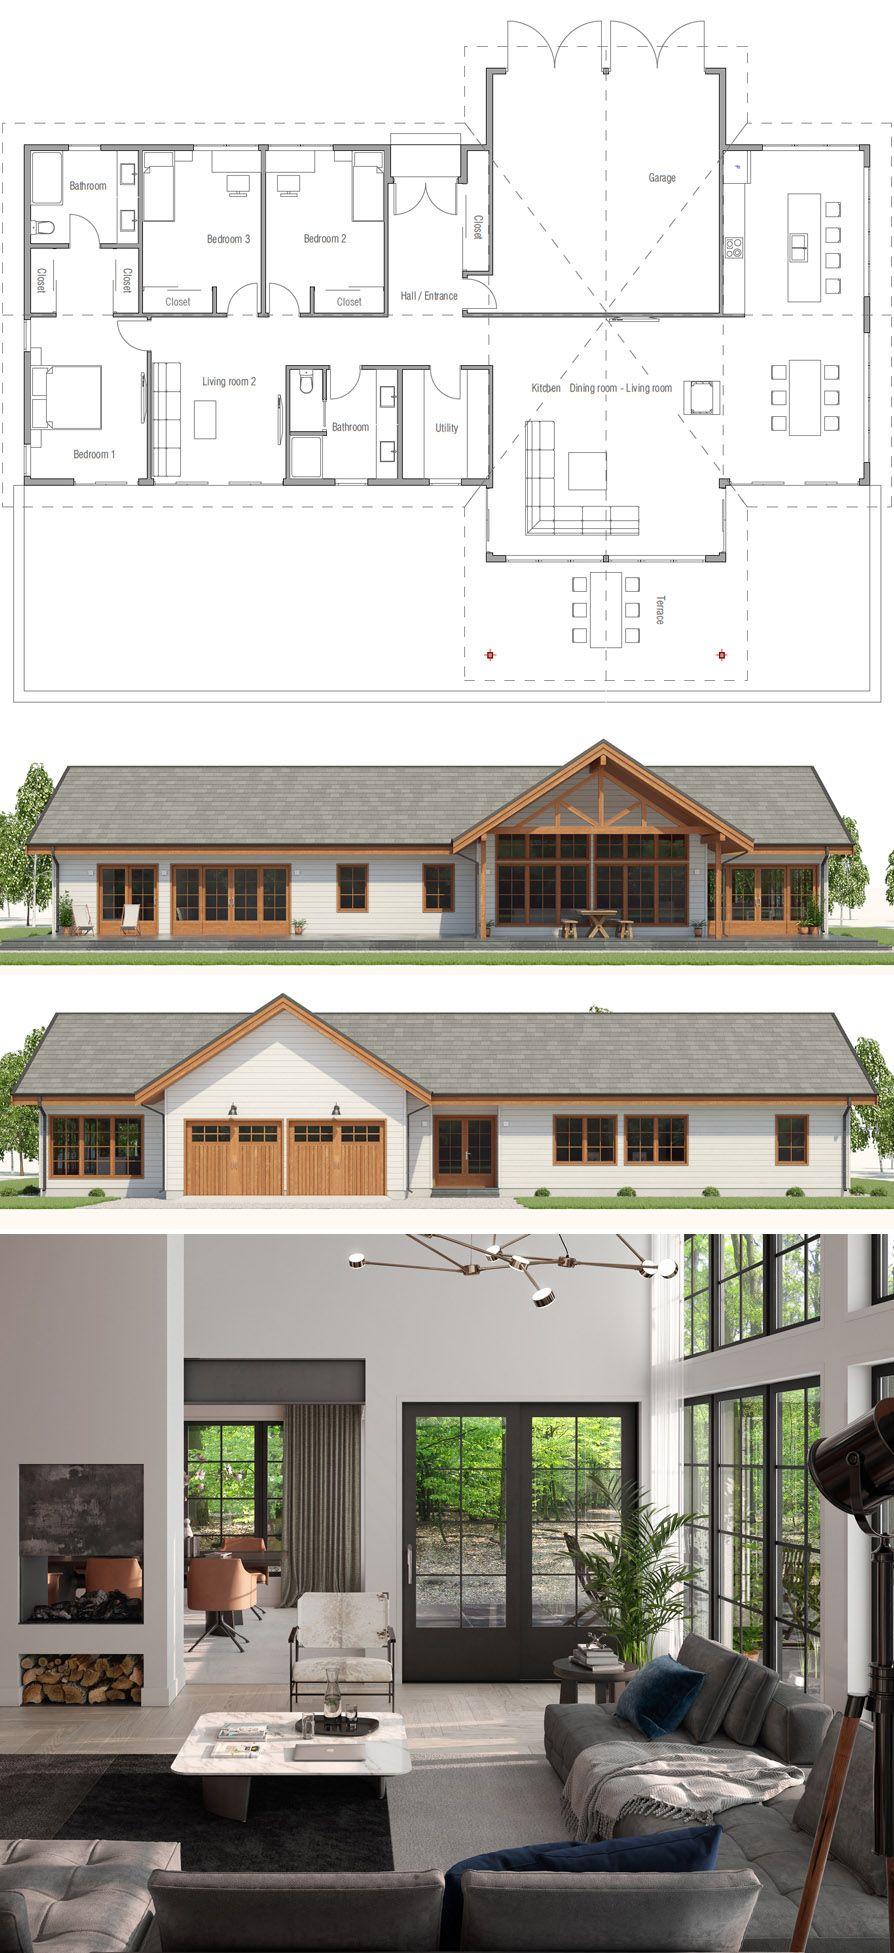 Floor Plans Floorplans Dwell House Plans Farmhouse House Plans Modern House Plans